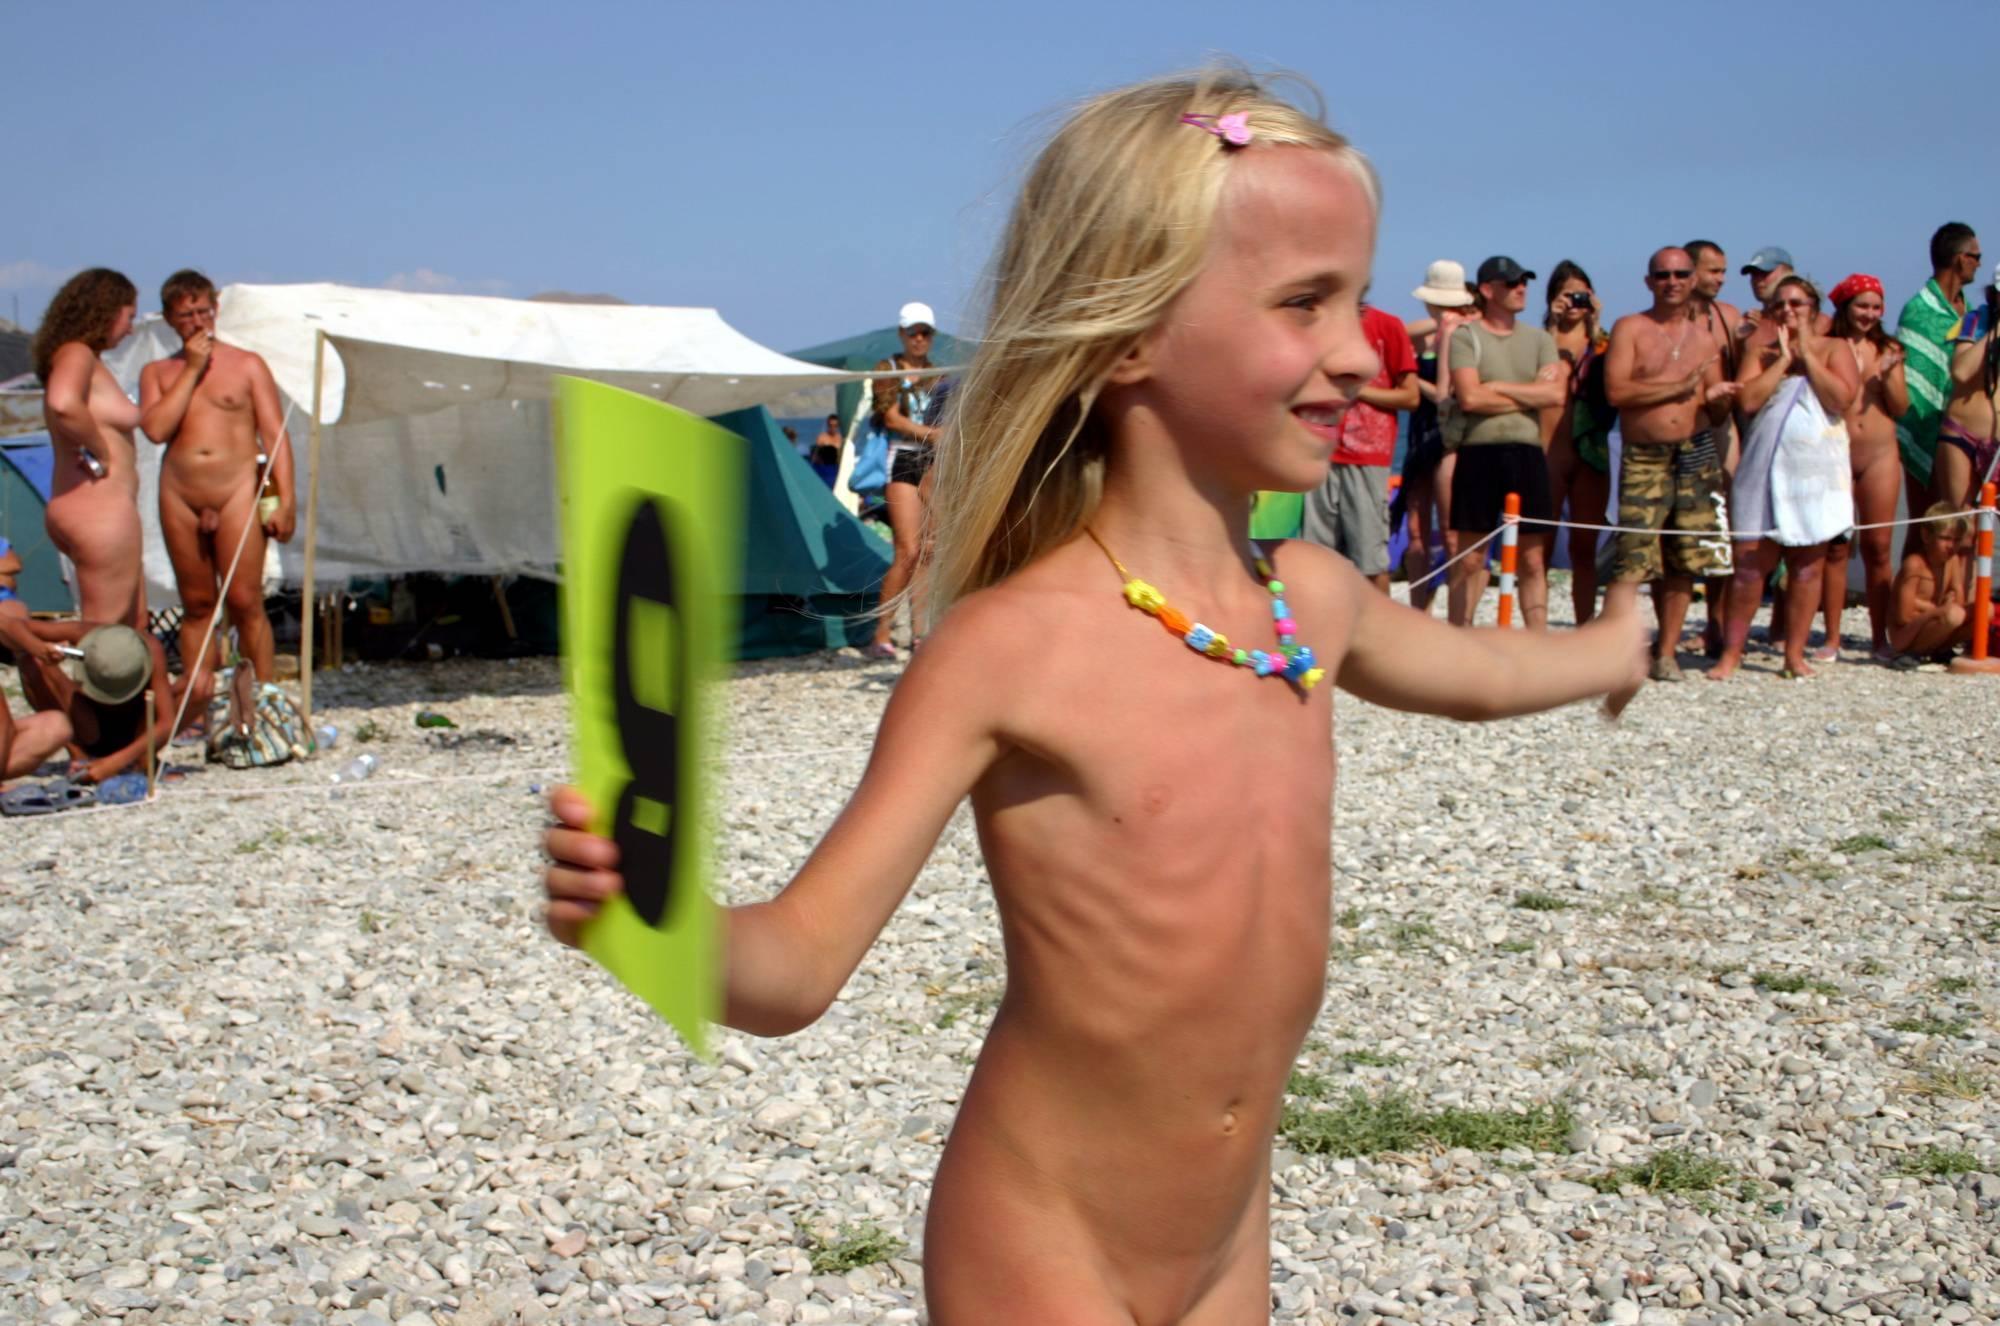 Nudist Pics Contestant Cheerful Walk - 1